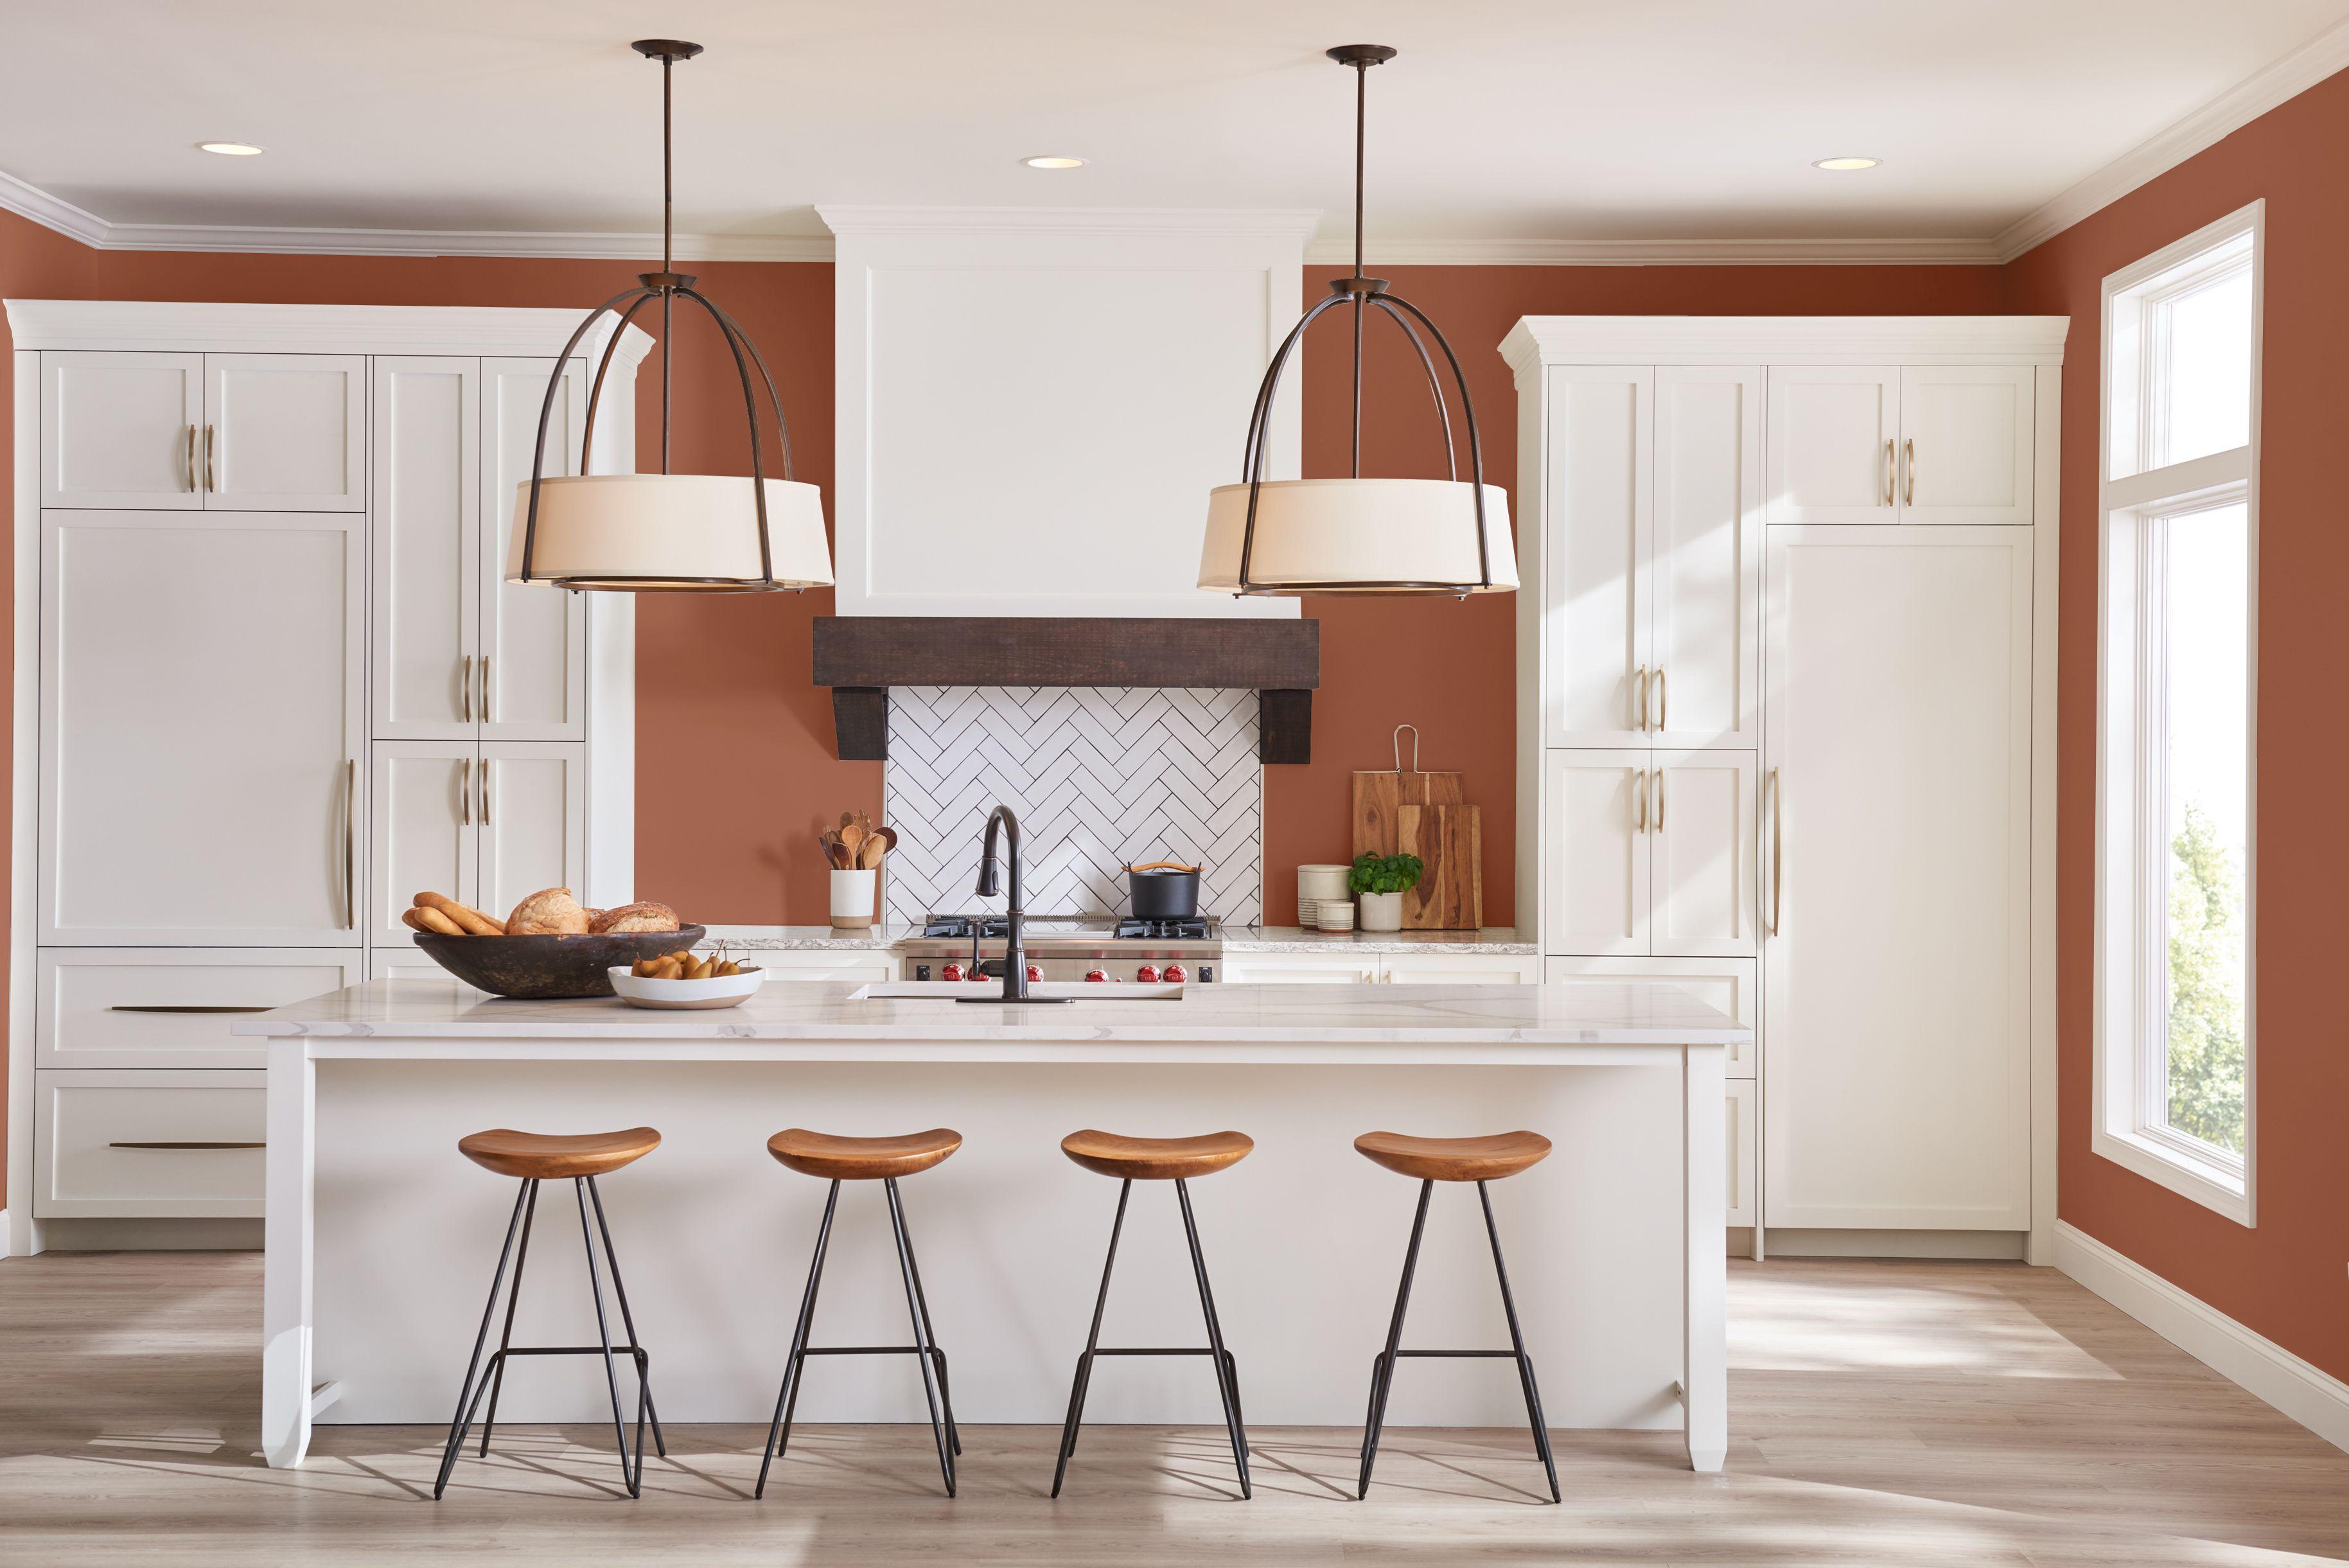 terracotta deco maison cuisine